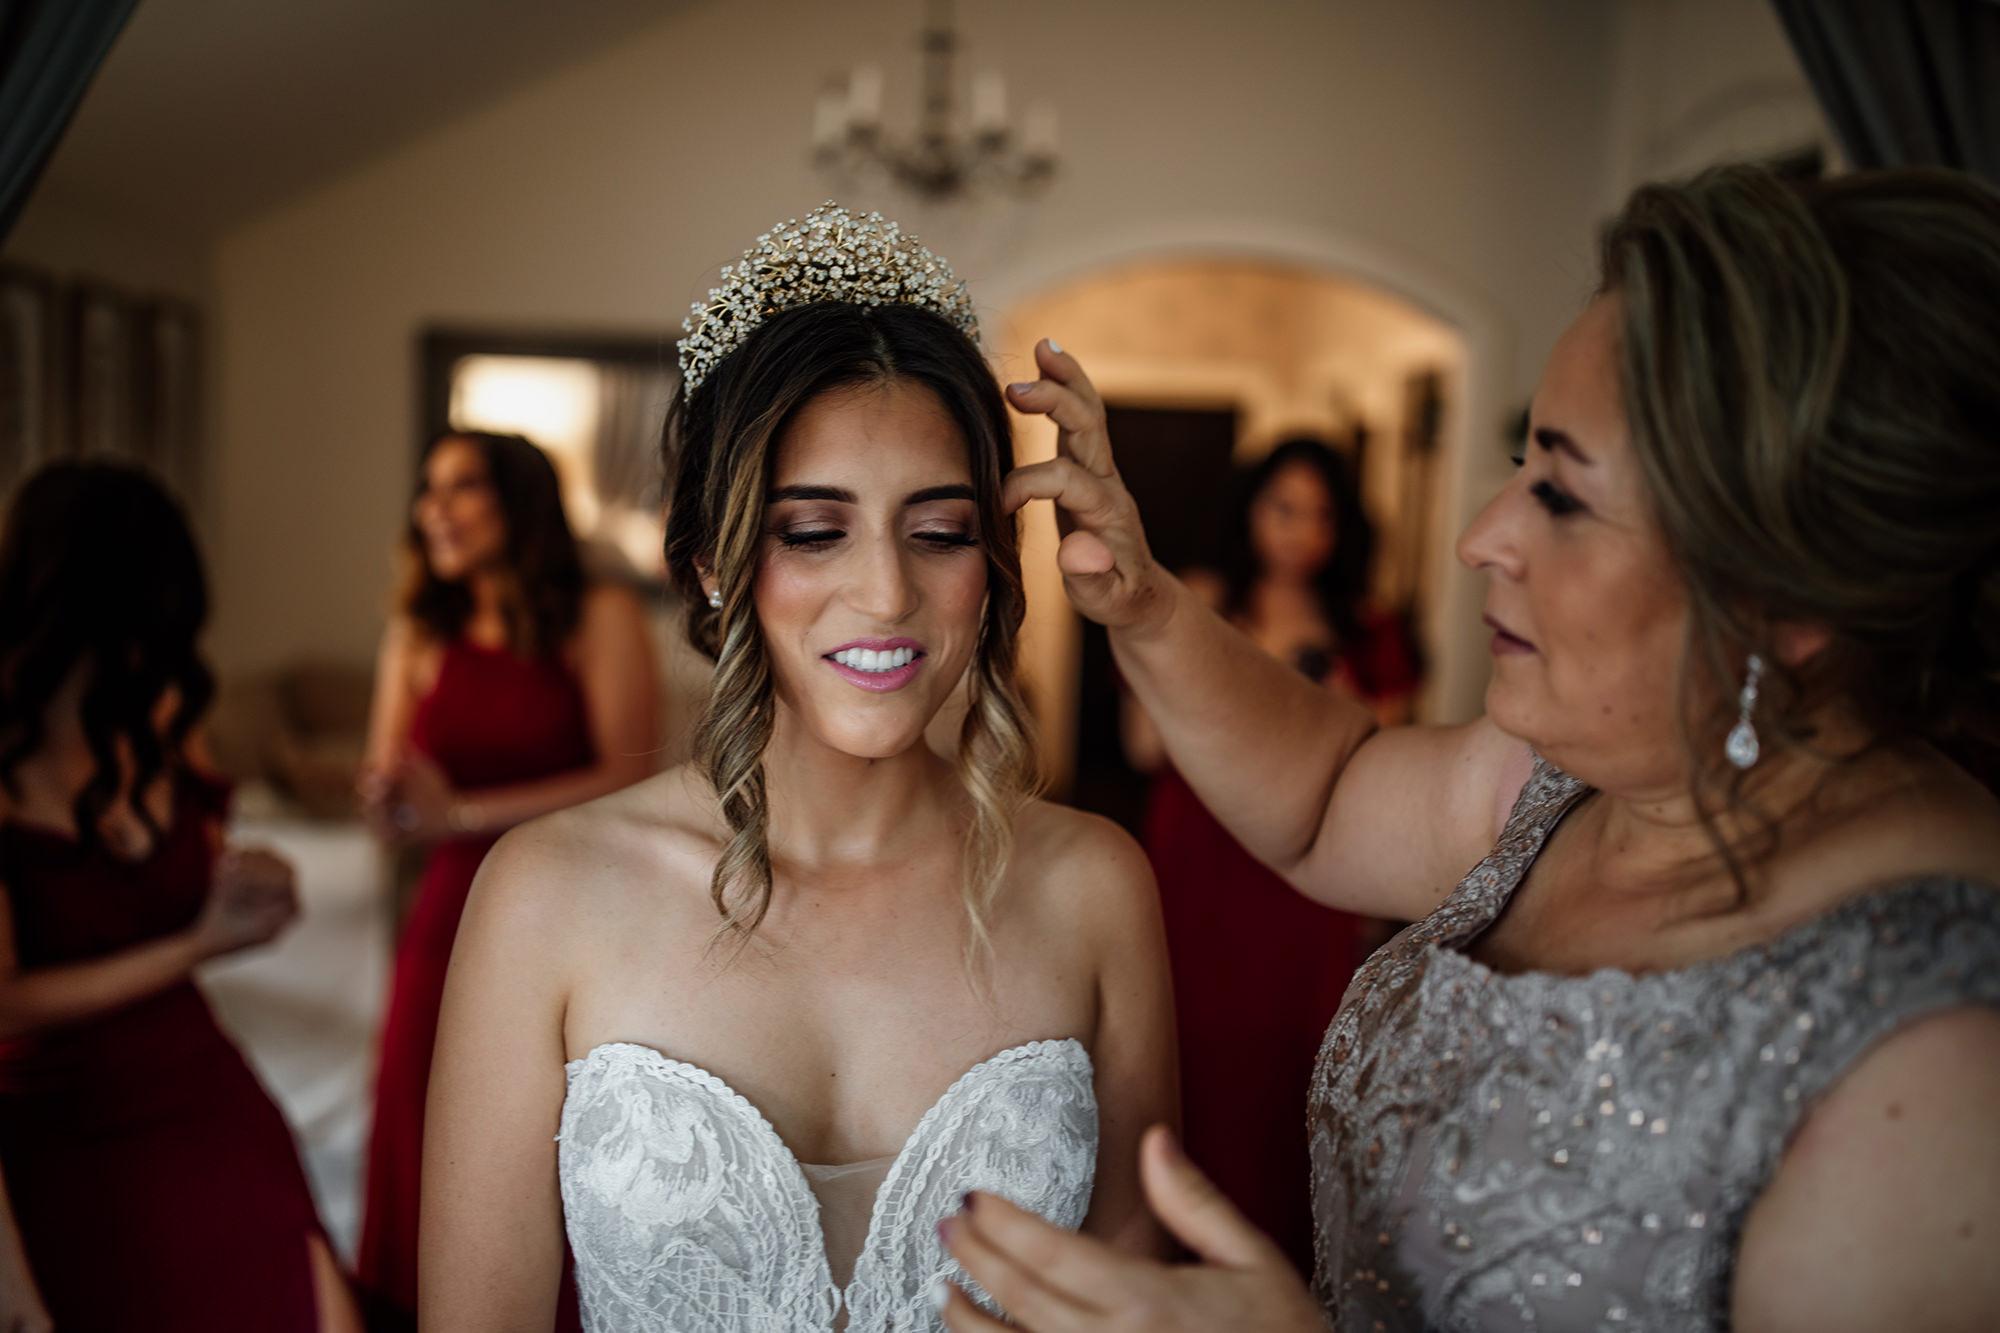 Mom helps bride put veil on at St Helena wedding.